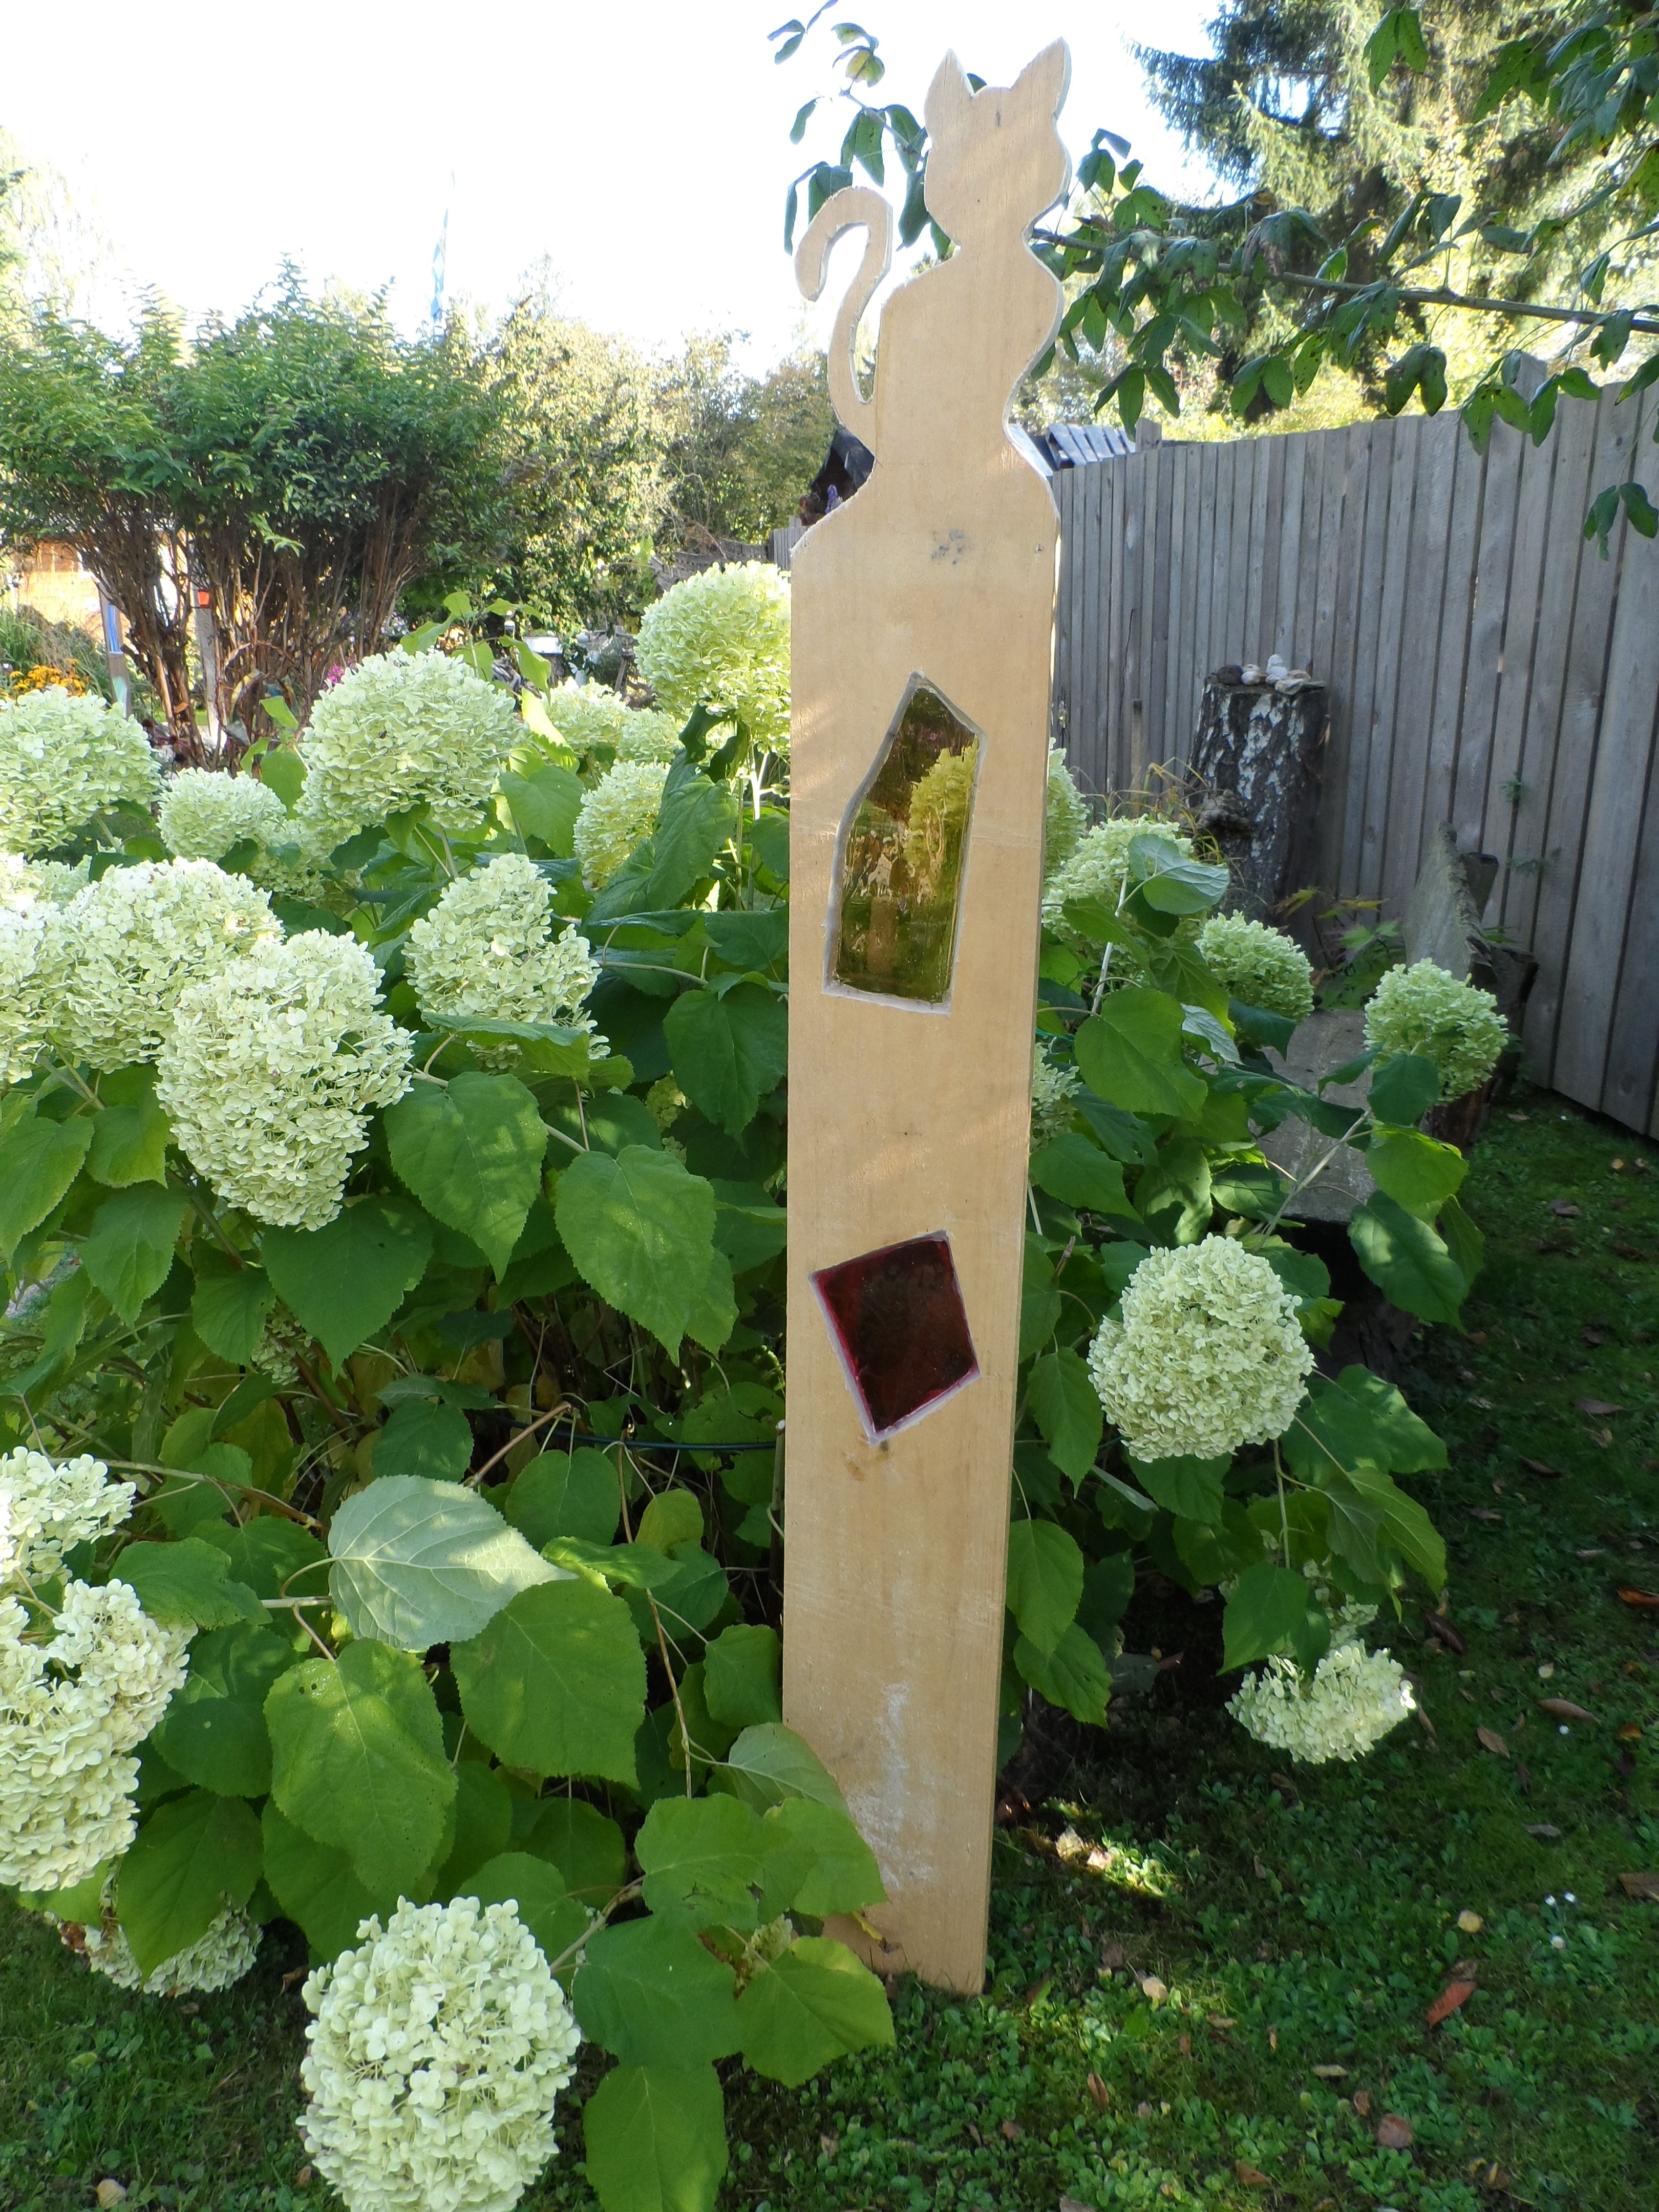 Holz glas deko holz arbeiten pinterest holz glas for Holz deko haus